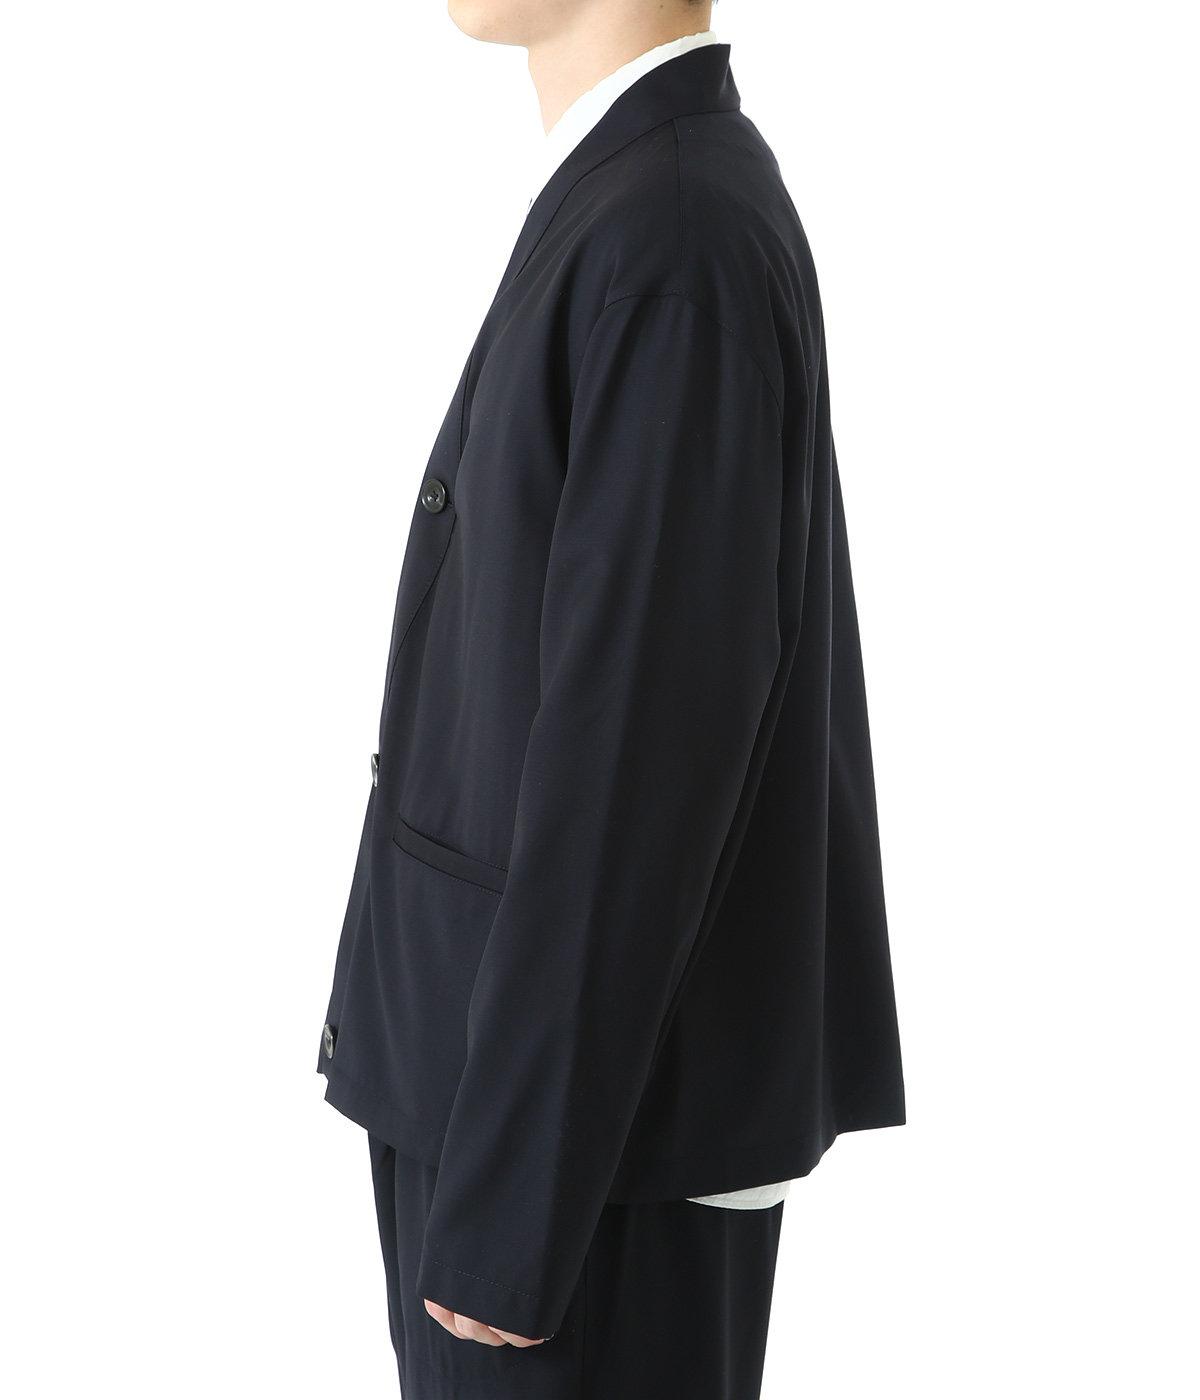 Sweater Mezzolitro-Leggero